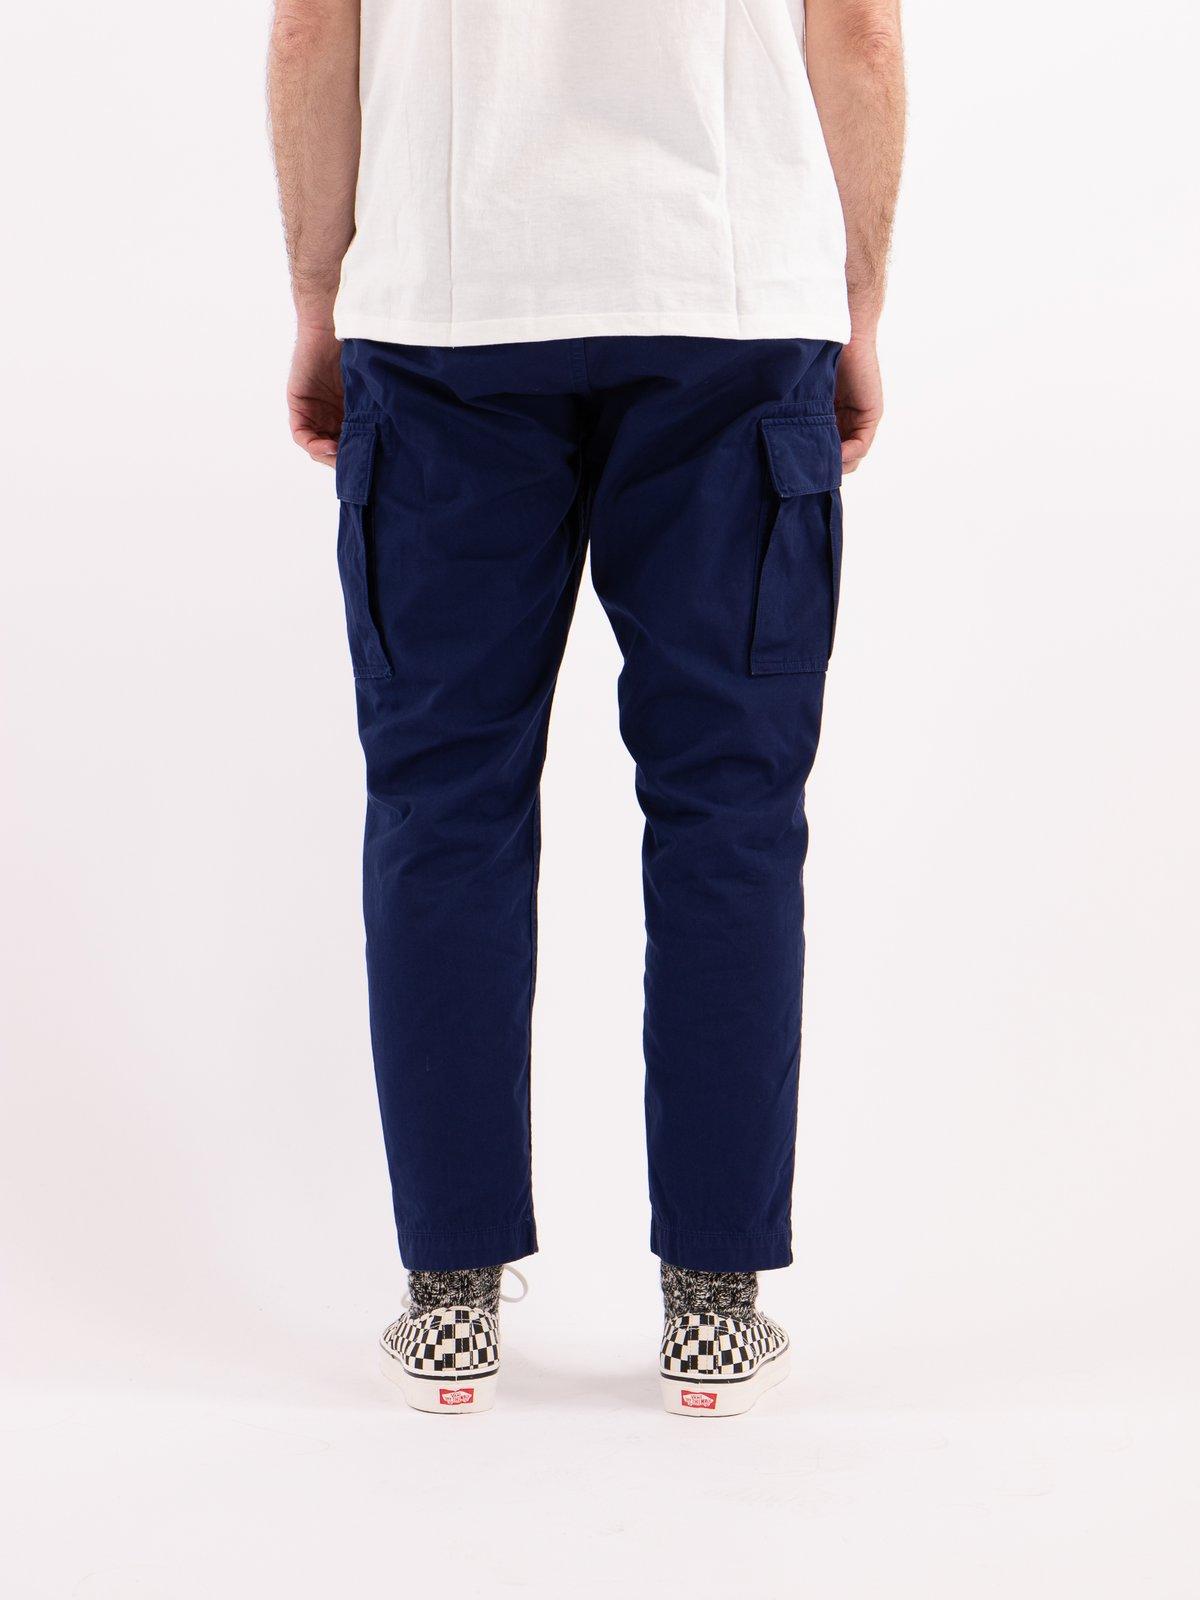 Ink Blue Poplin Easy Cargo Pant - Image 4